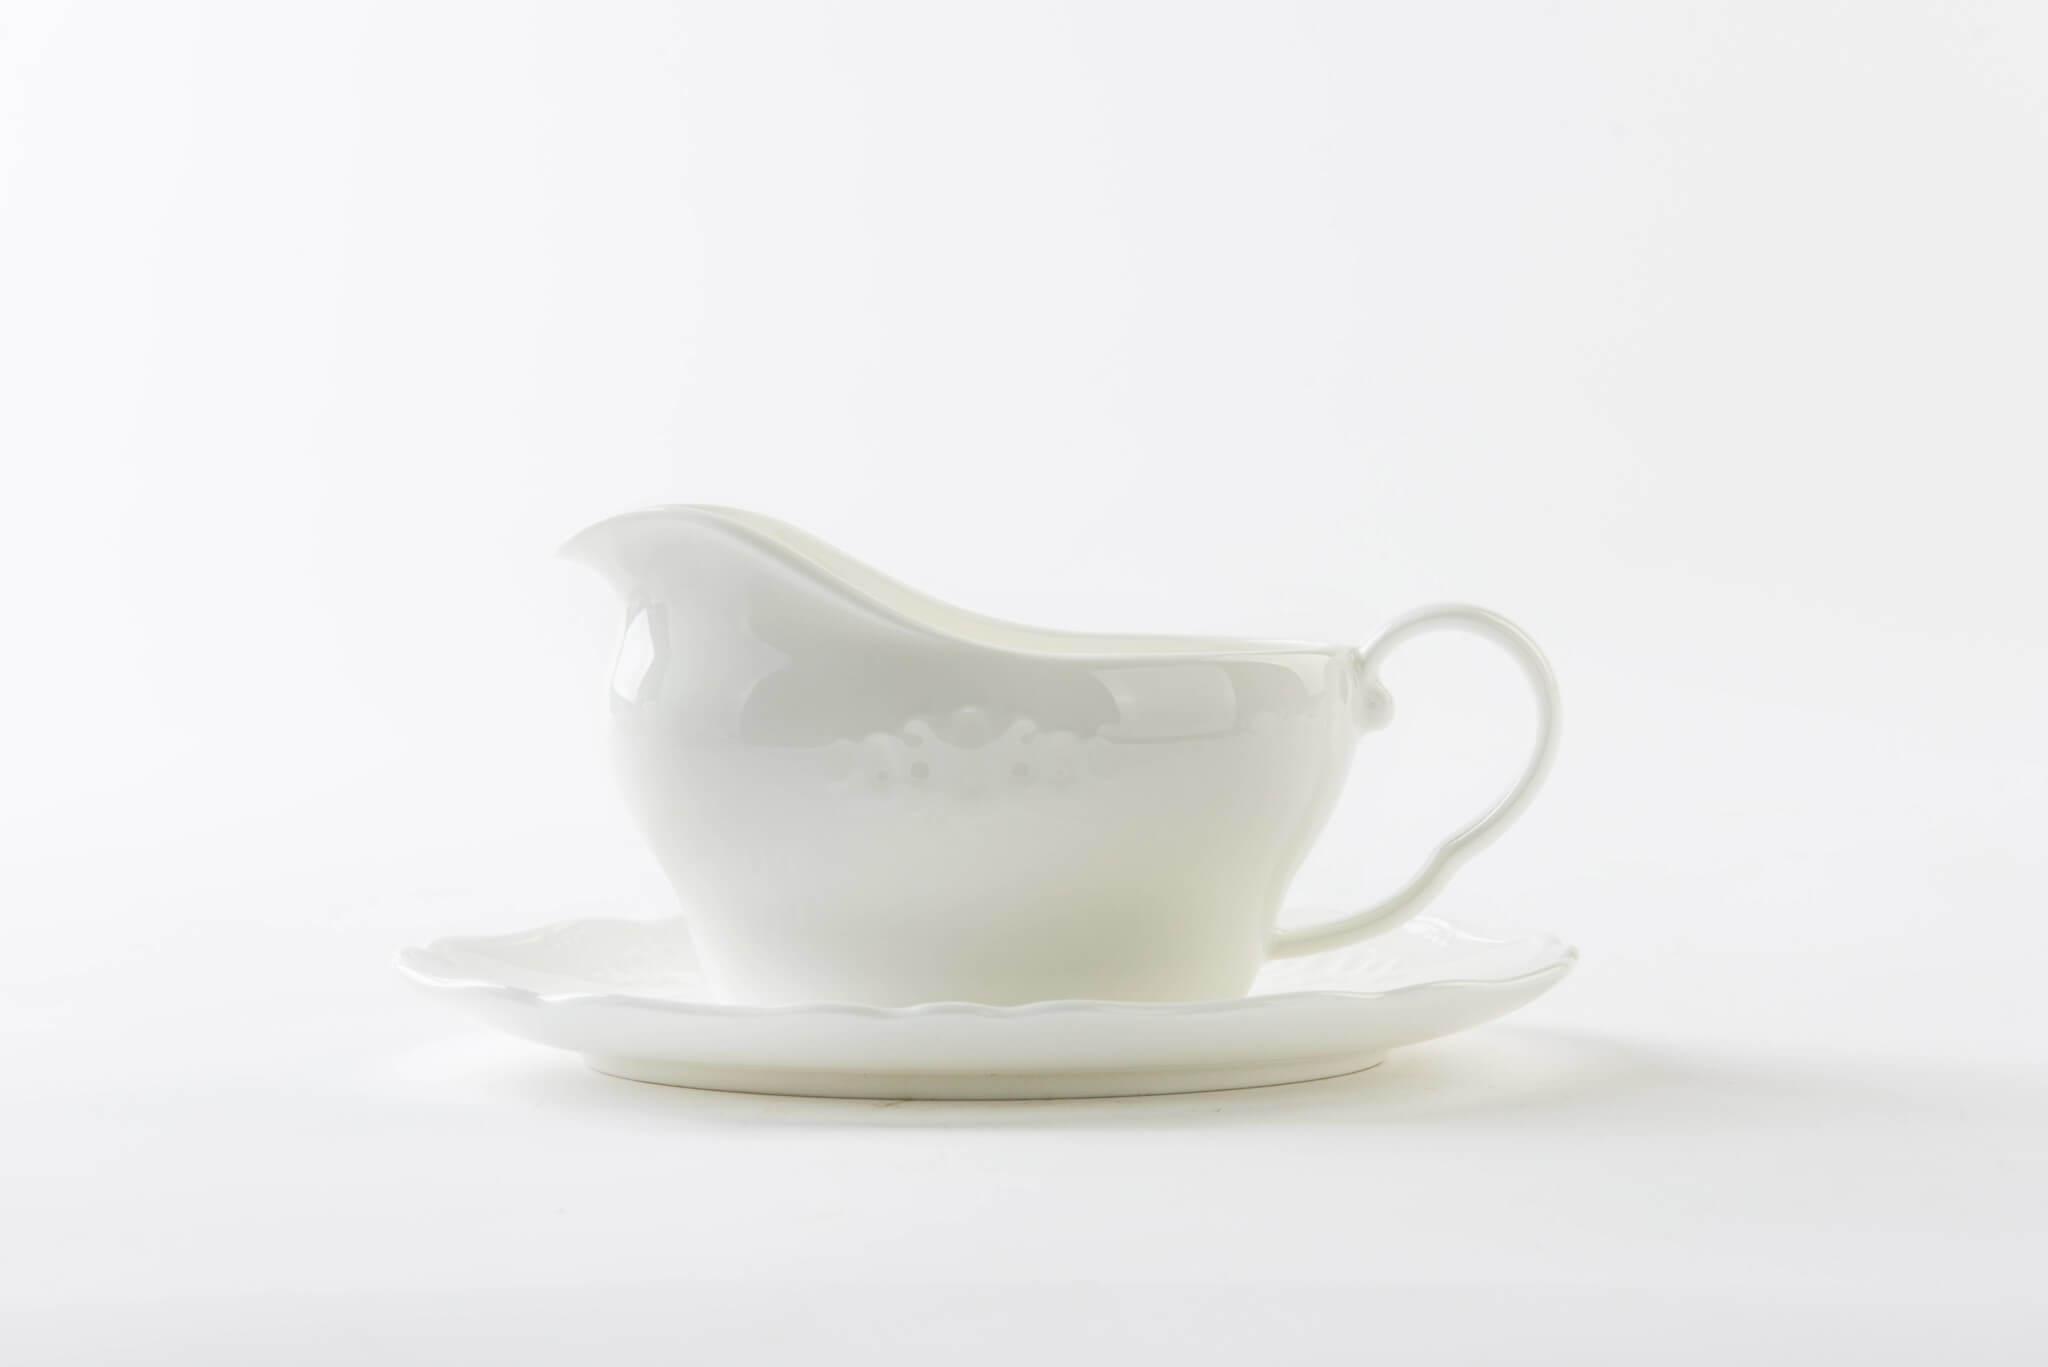 ... embossed white bone china gravy boat ... & Embossed white bone china dinnerware - Bone China Products Supplier